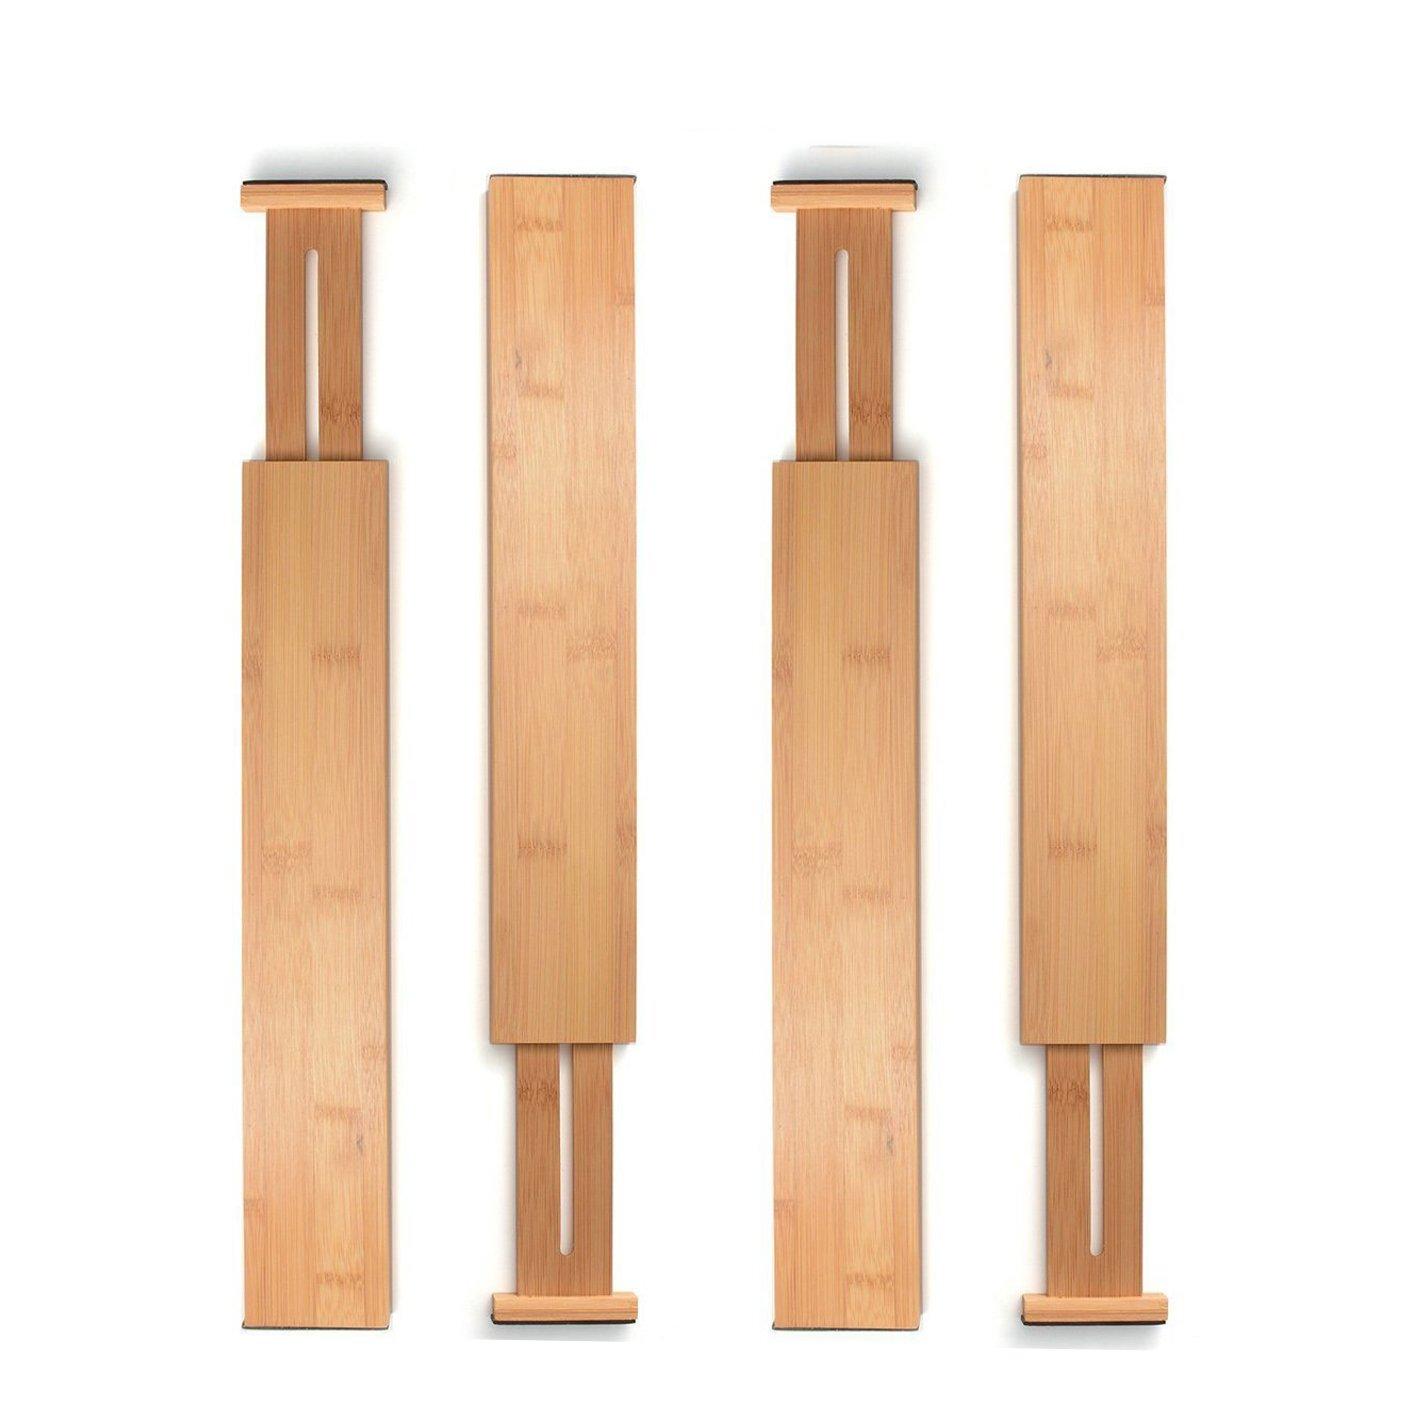 Bambusi Bamboo Drawer Dividers Kitchen Organizer - Spring Adjustable & Expandable - Best for Kitchen, Dresser, Bedroom, Baby Drawer, Bathroom, and Desk. (Set of 4)